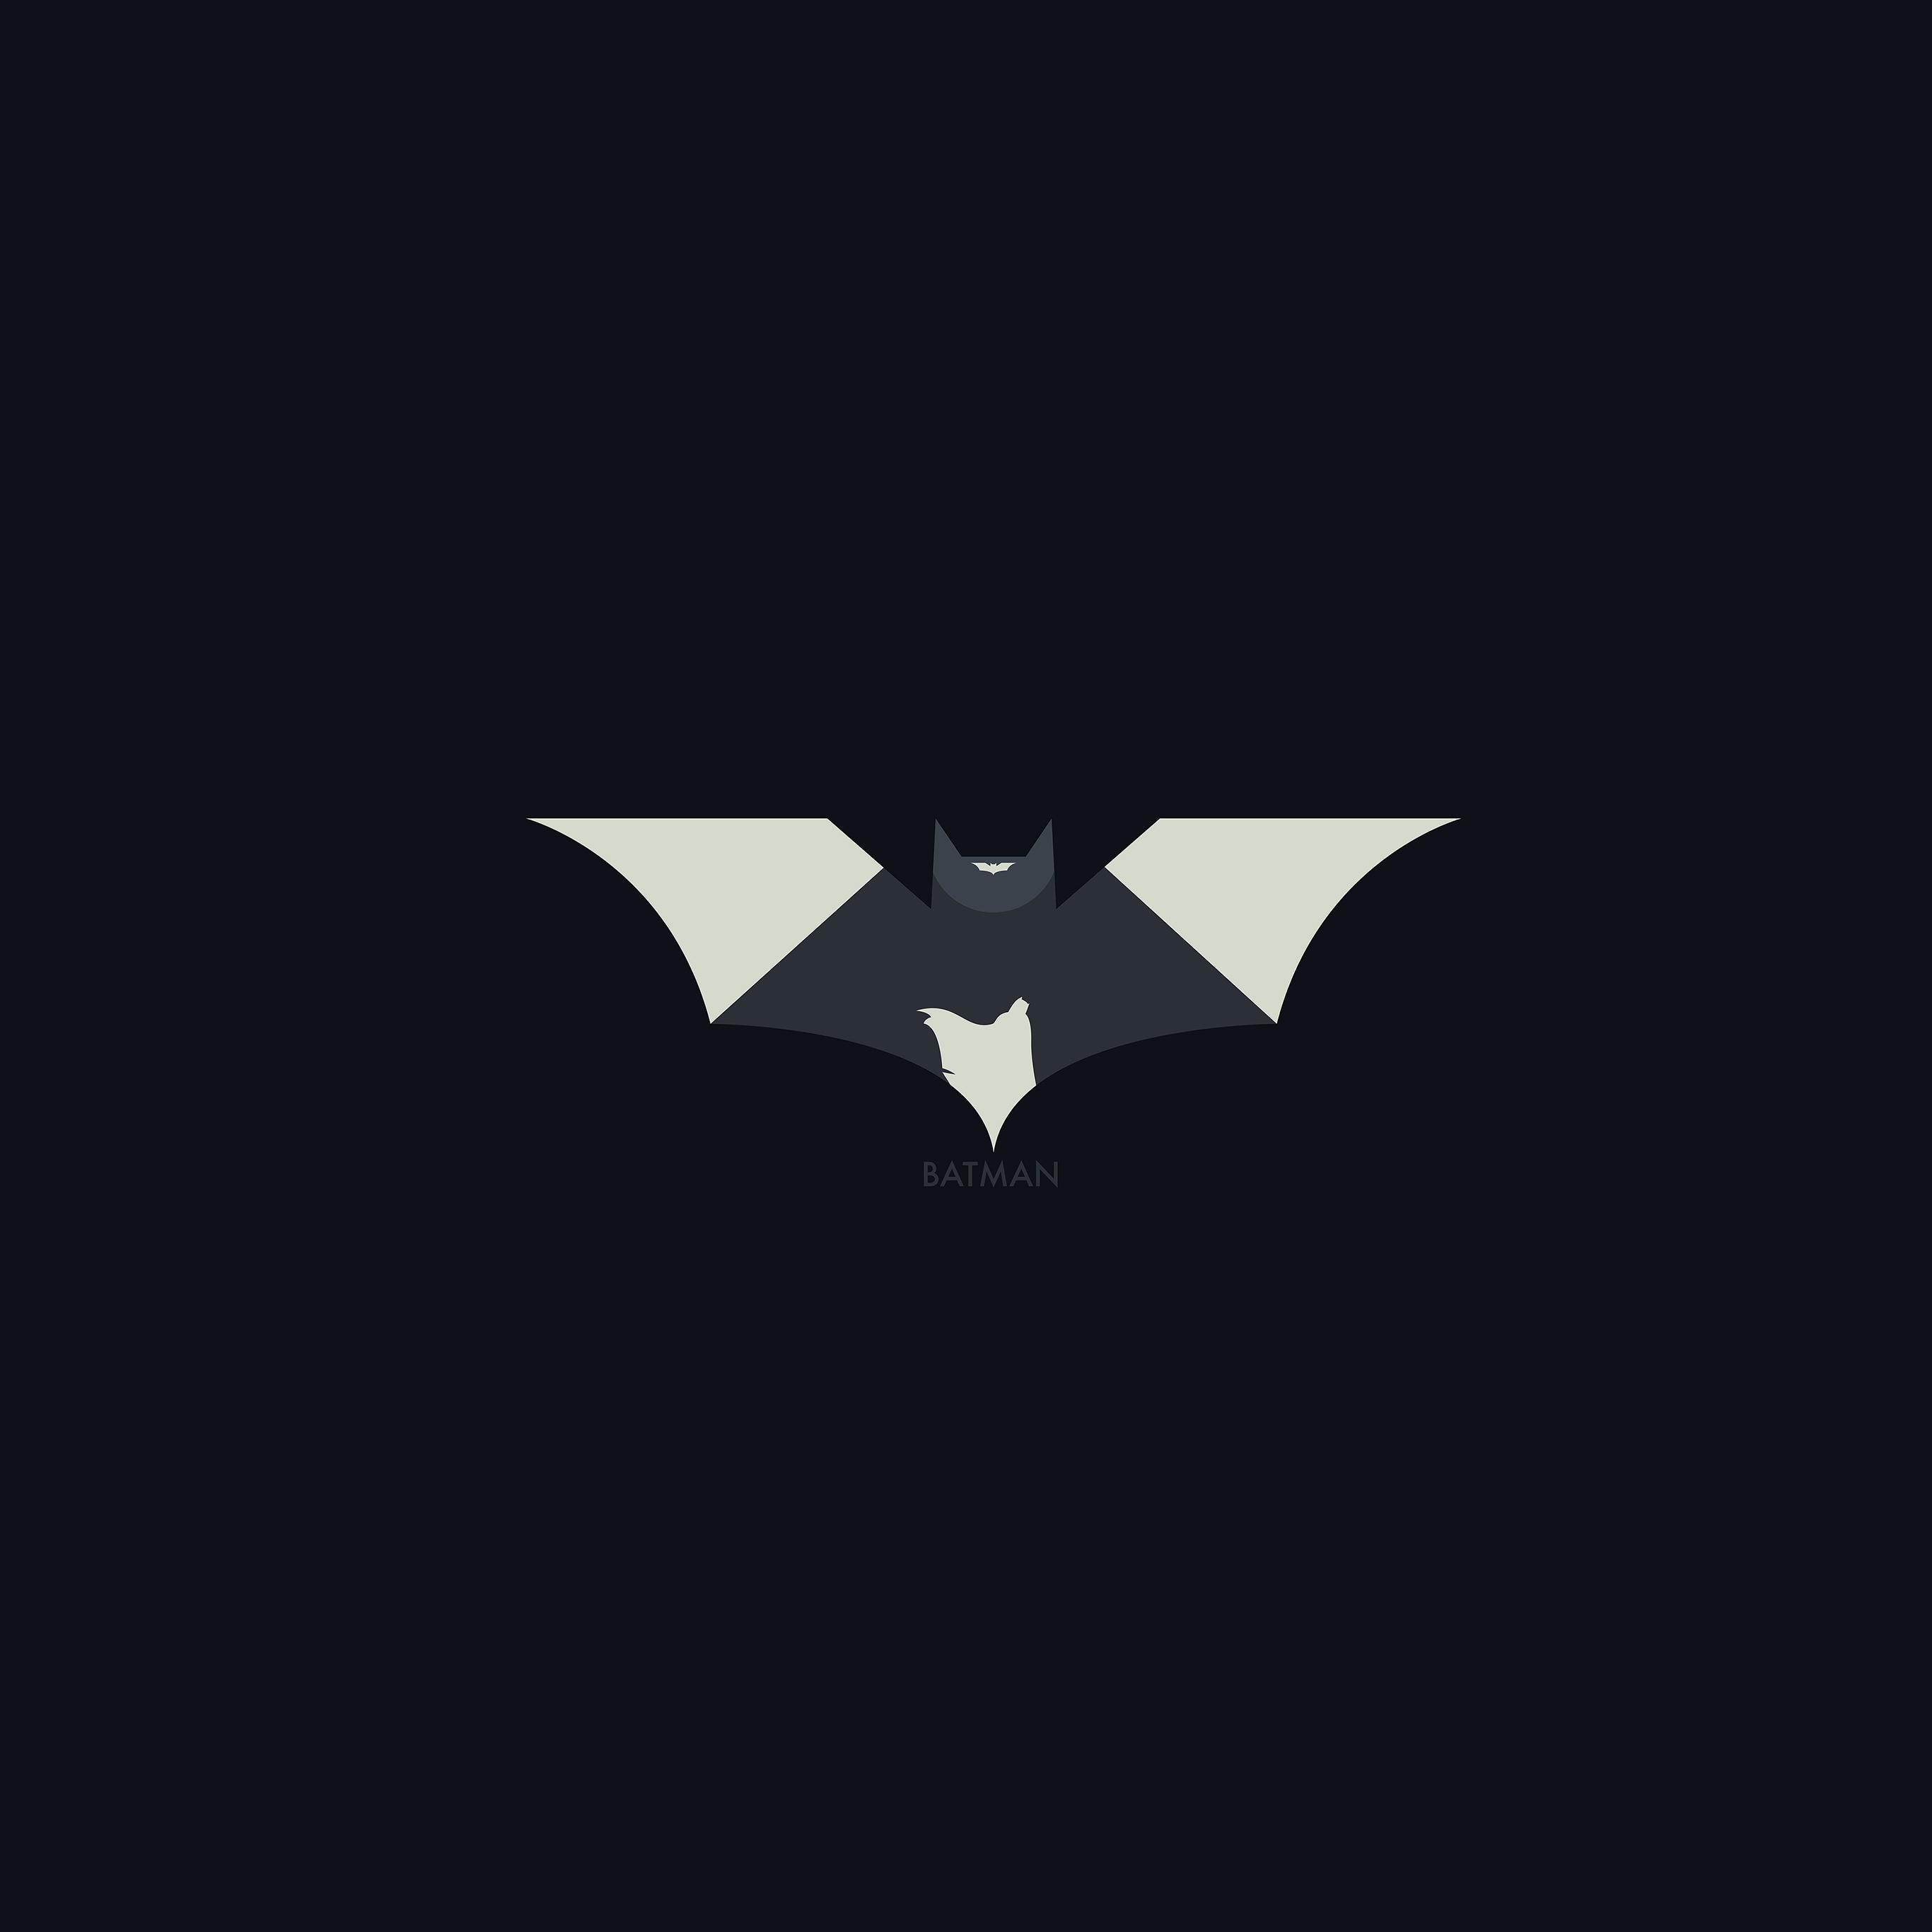 I love papers ao28 hugoli art batman minimal logo illust for Minimal art logo